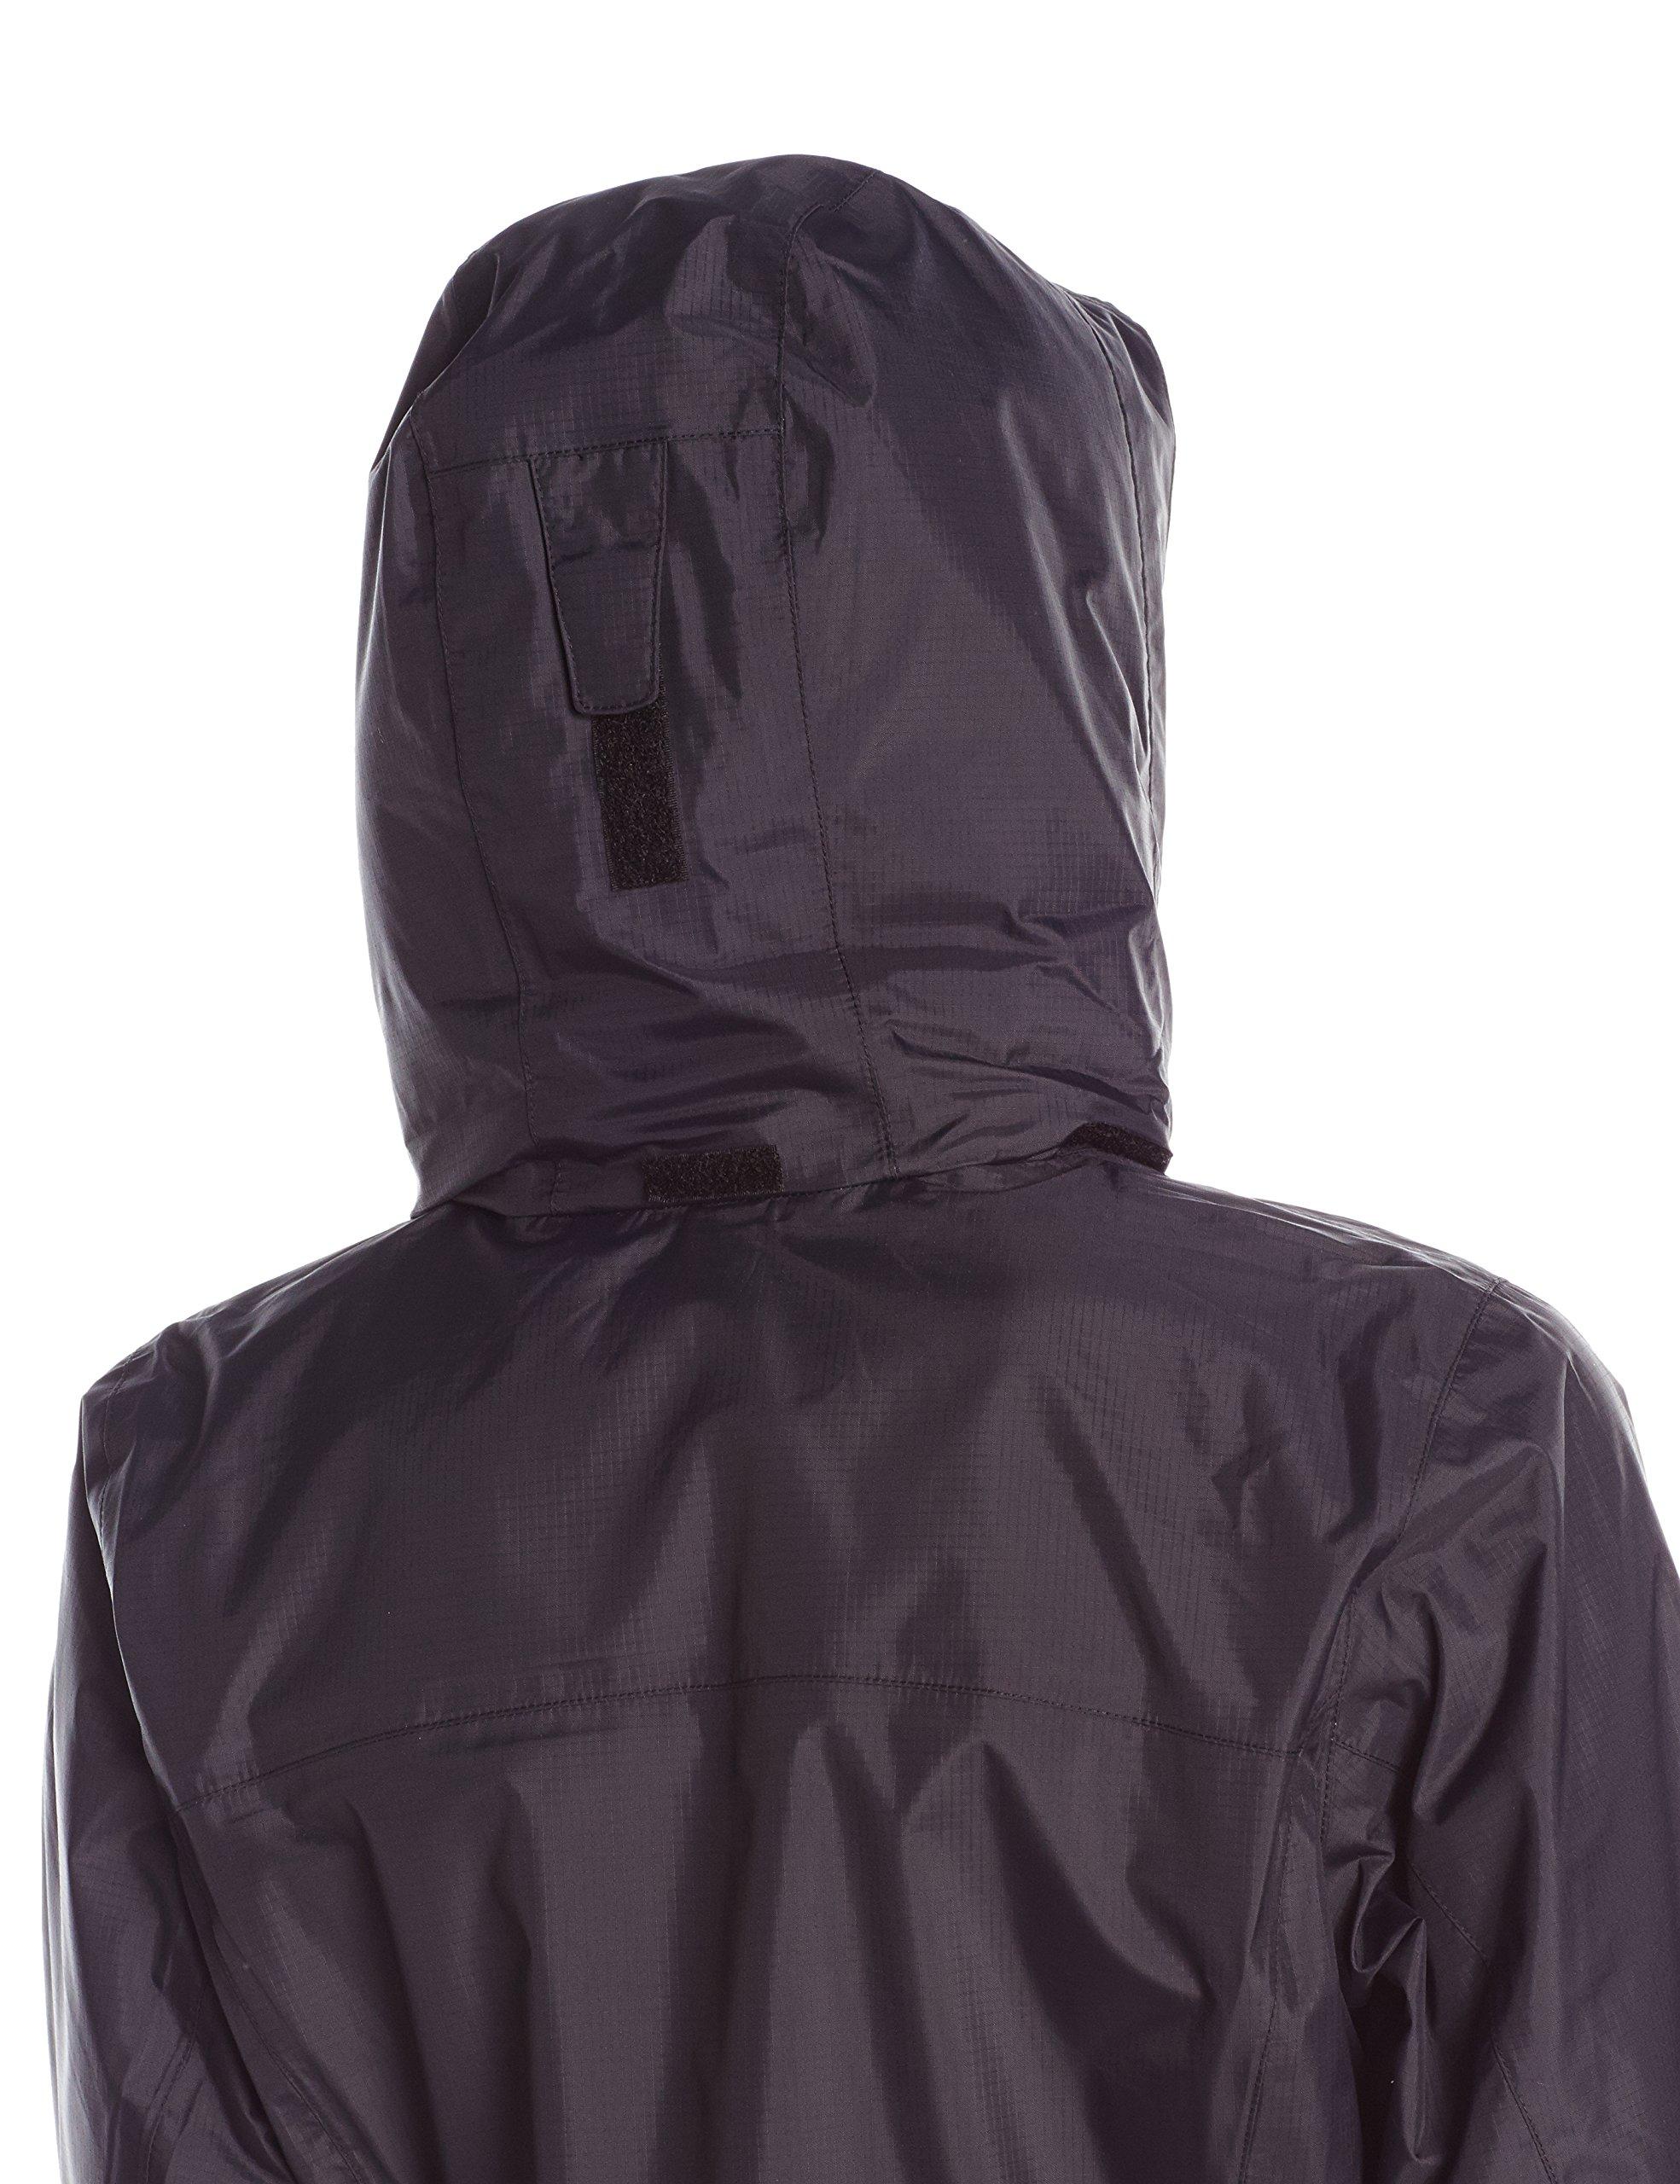 Columbia Women's Pouration Waterproof Rain Jacket, Medium, Black by Columbia (Image #3)